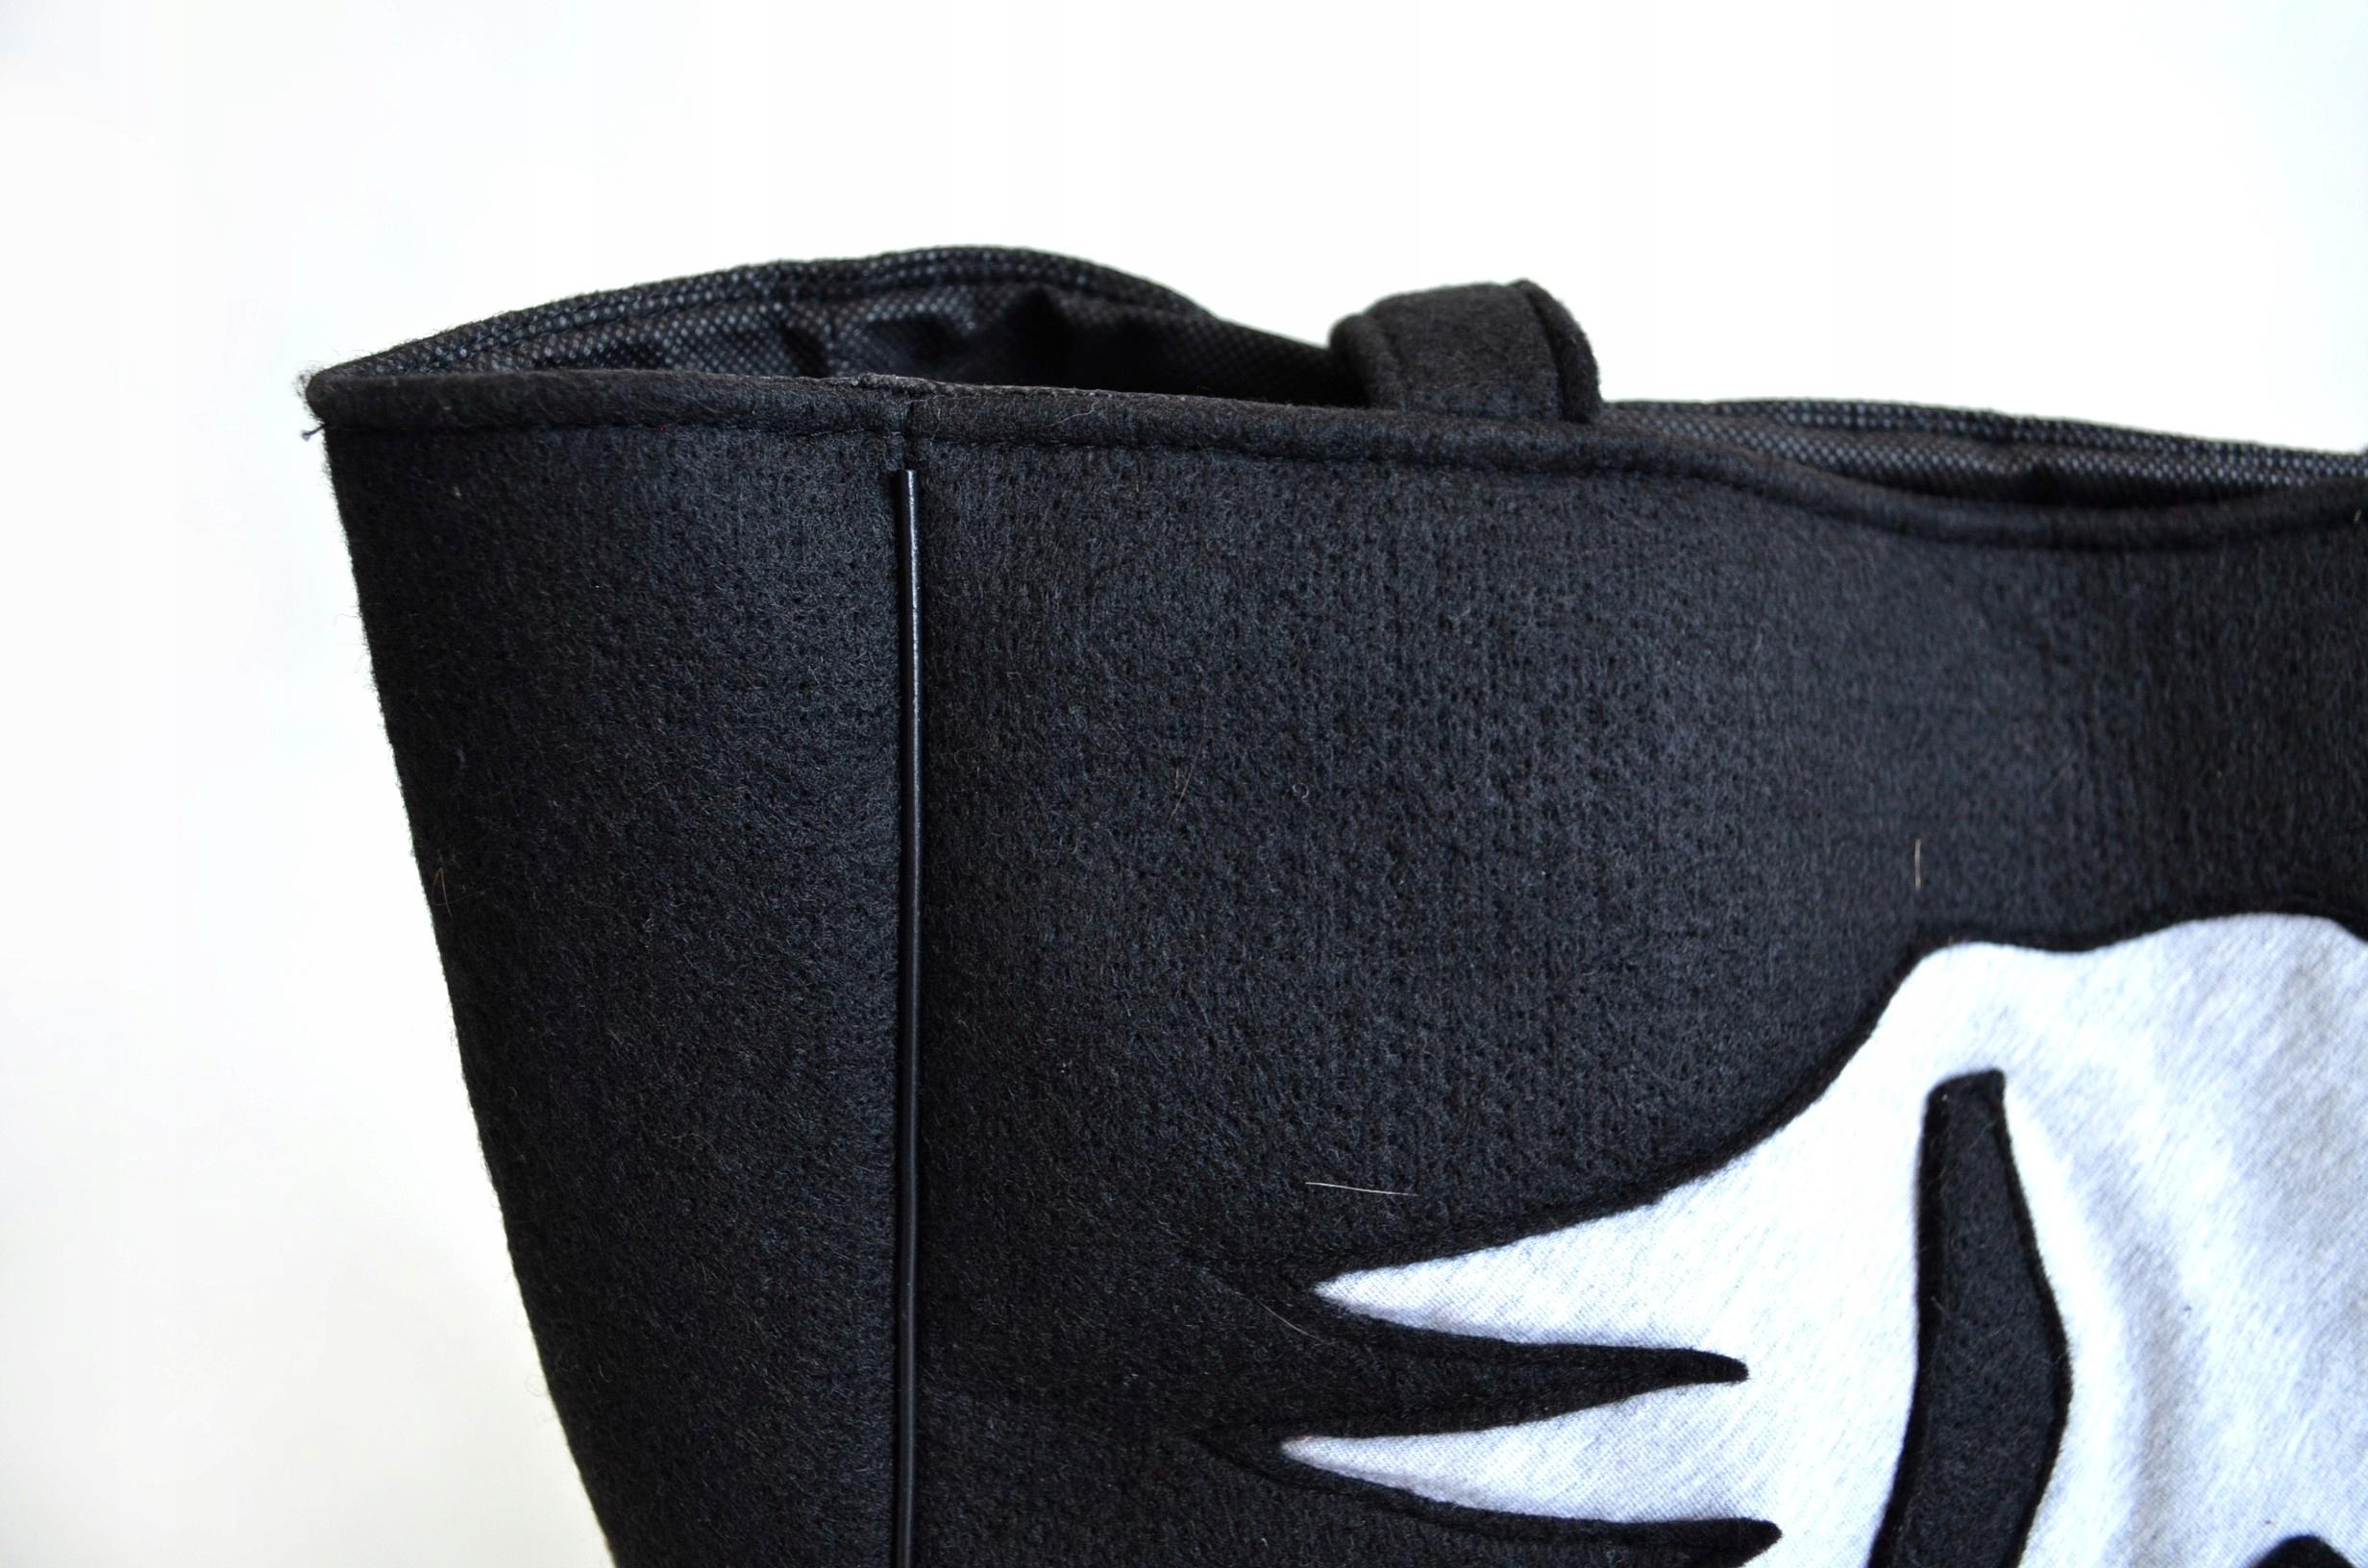 cbed40cef12d8 Duża czarna filcowa torba SHOPPER na ramię boho - 7303174448 ...